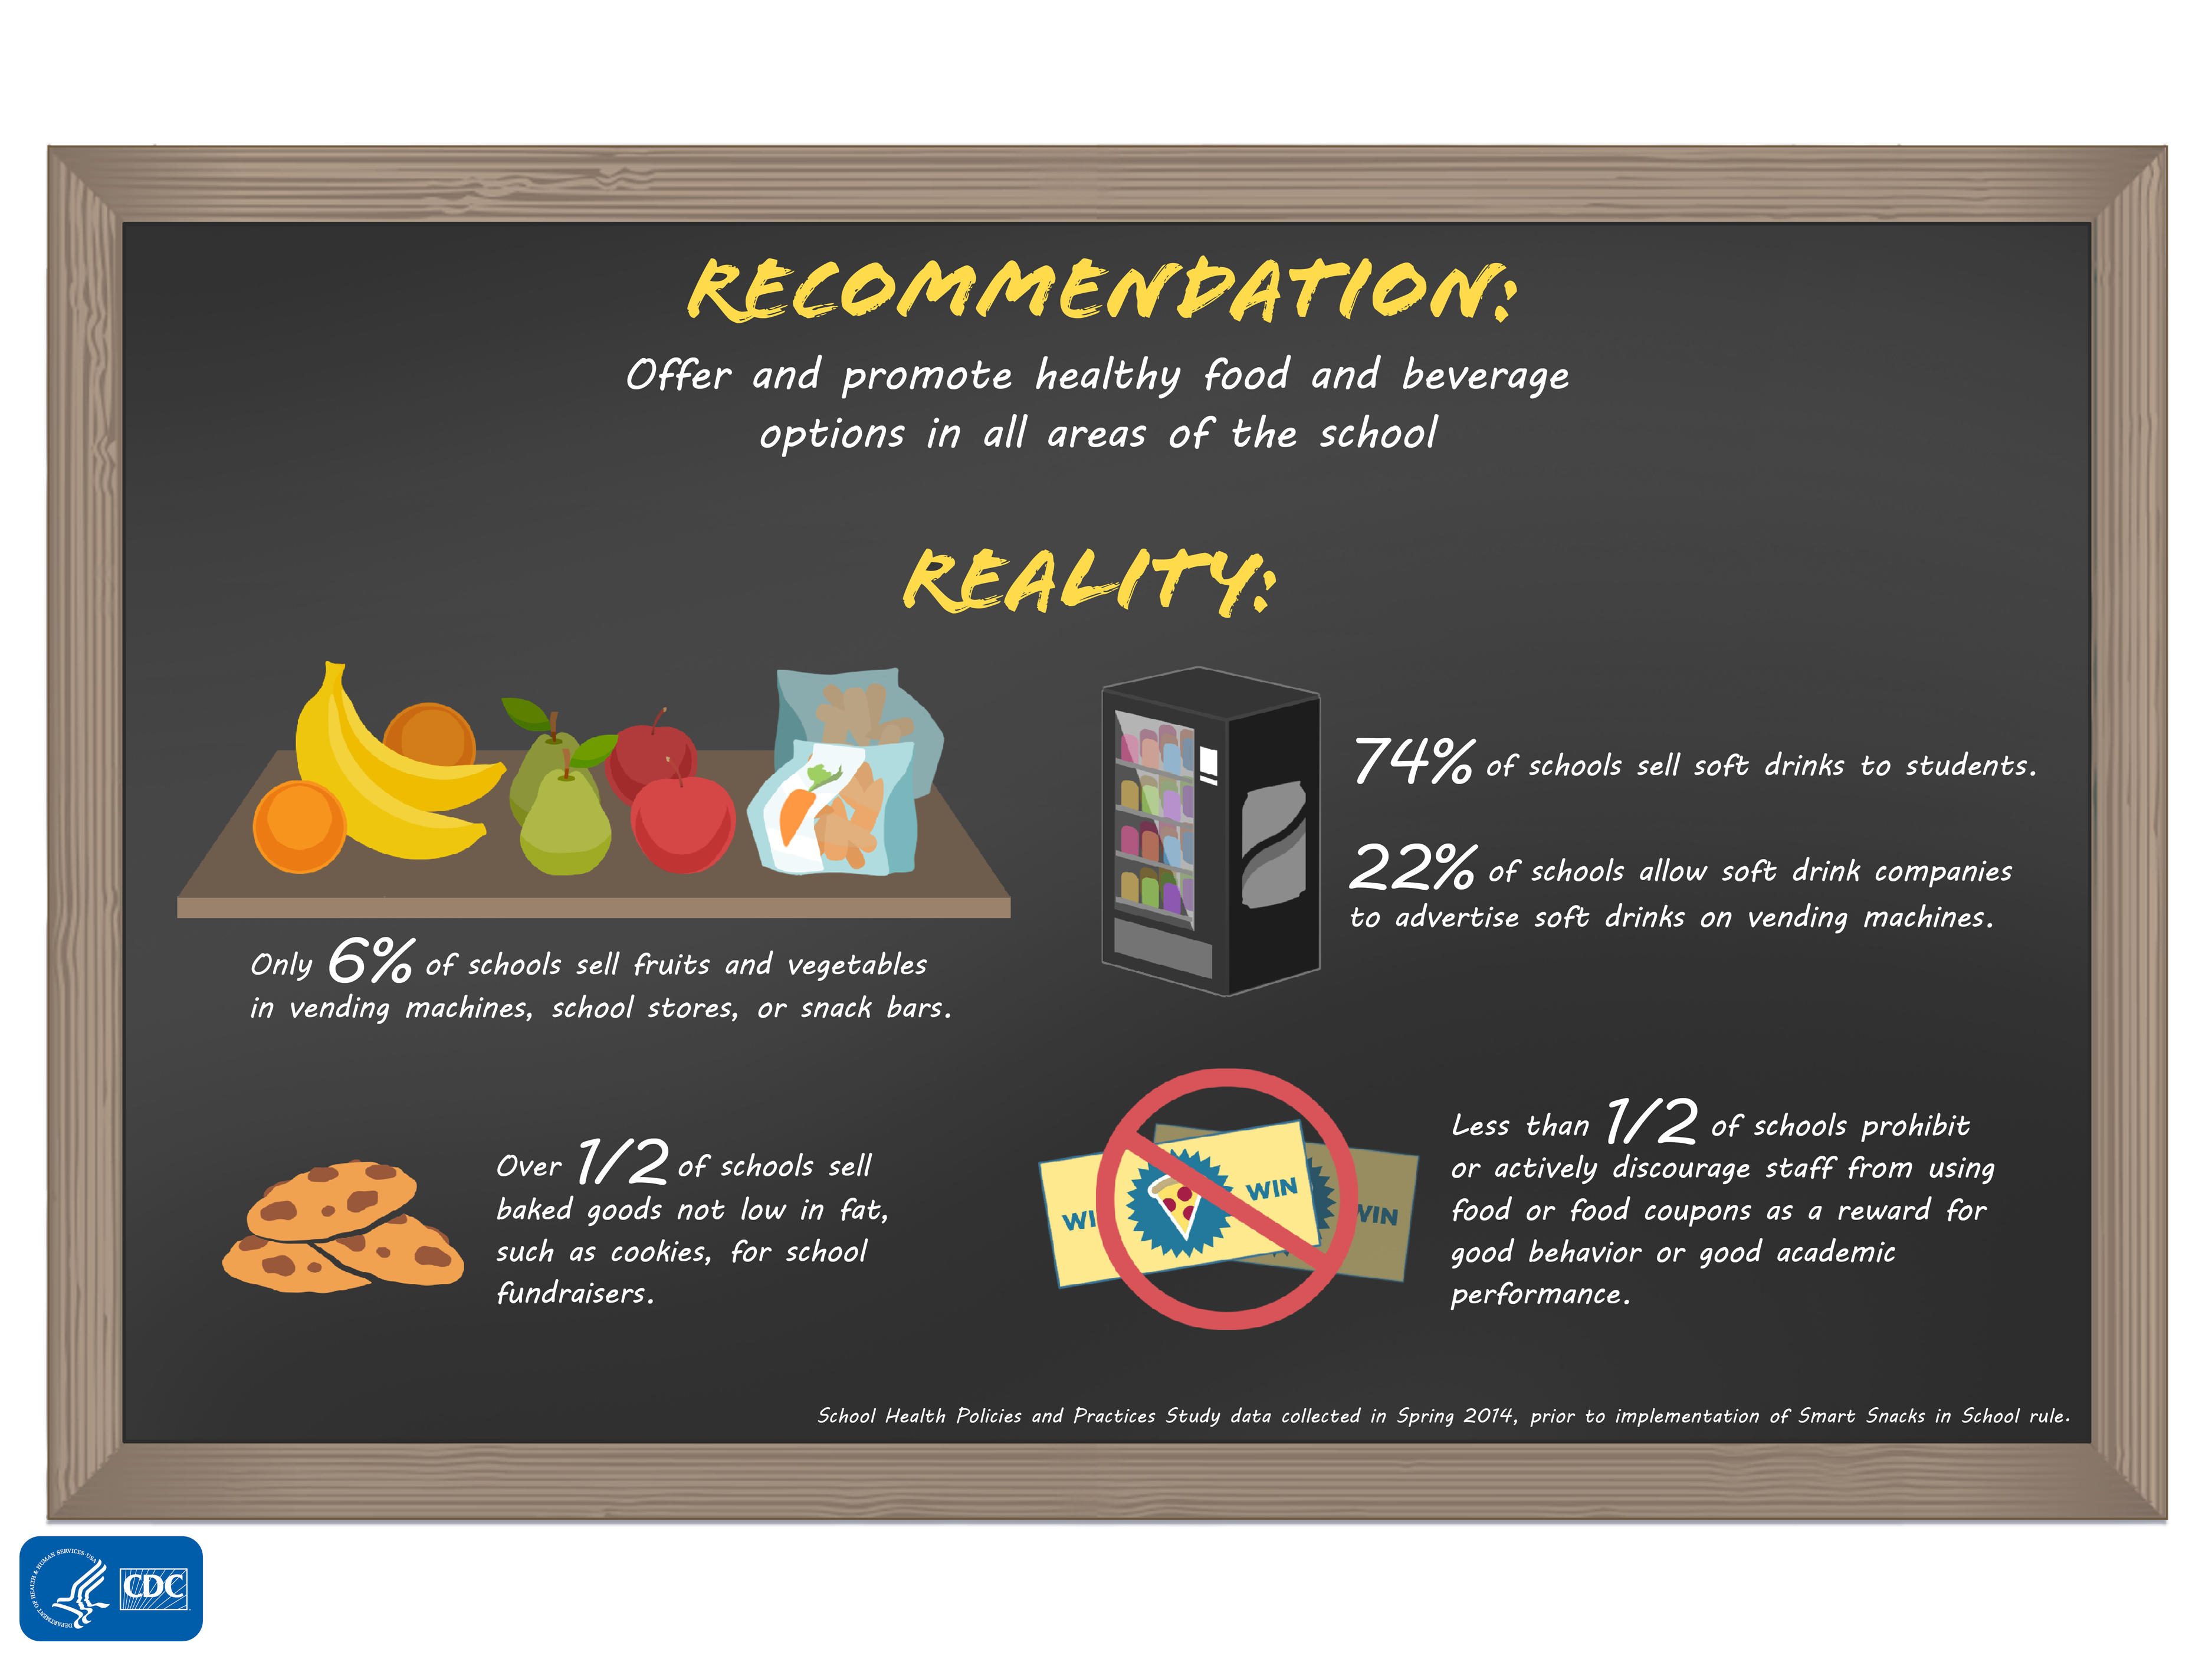 Click to Enlarge(https://www.cdc.gov/healthyschools/images/parentengagement/ Healthy-Students_badge2-037-037-037.png)